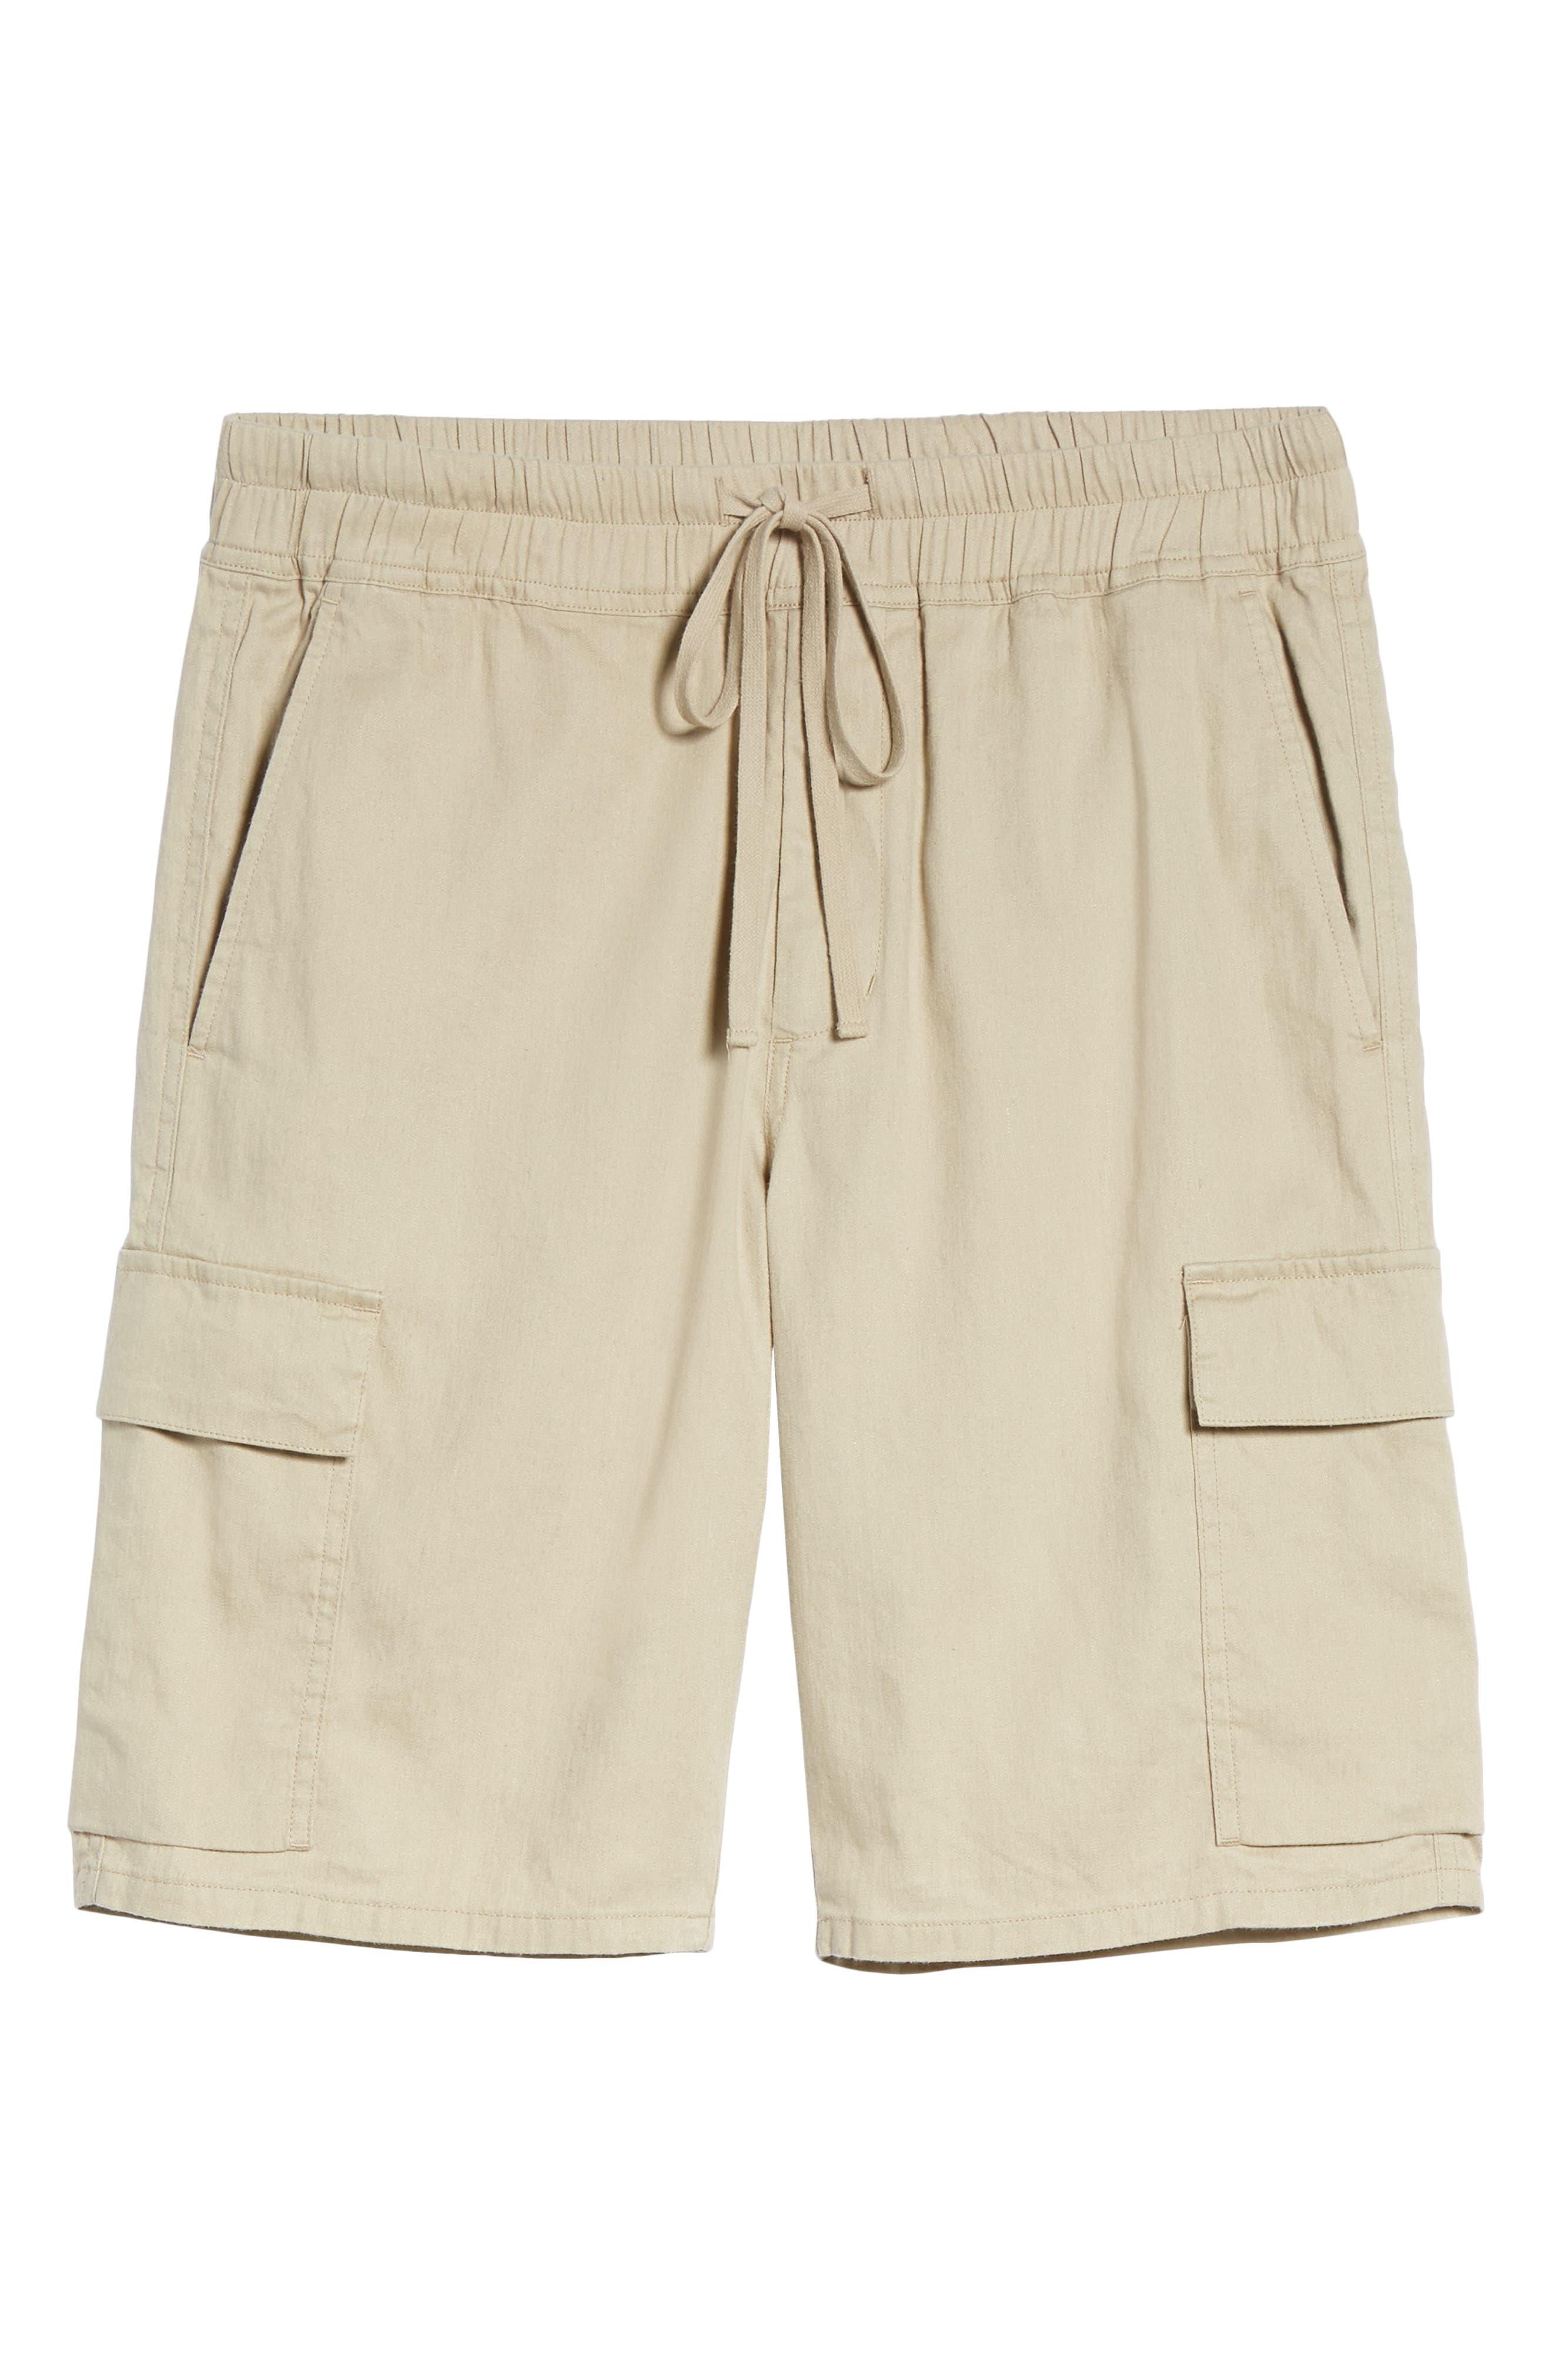 Stretch Linen & Cotton Cargo Shorts,                             Alternate thumbnail 7, color,                             Flax